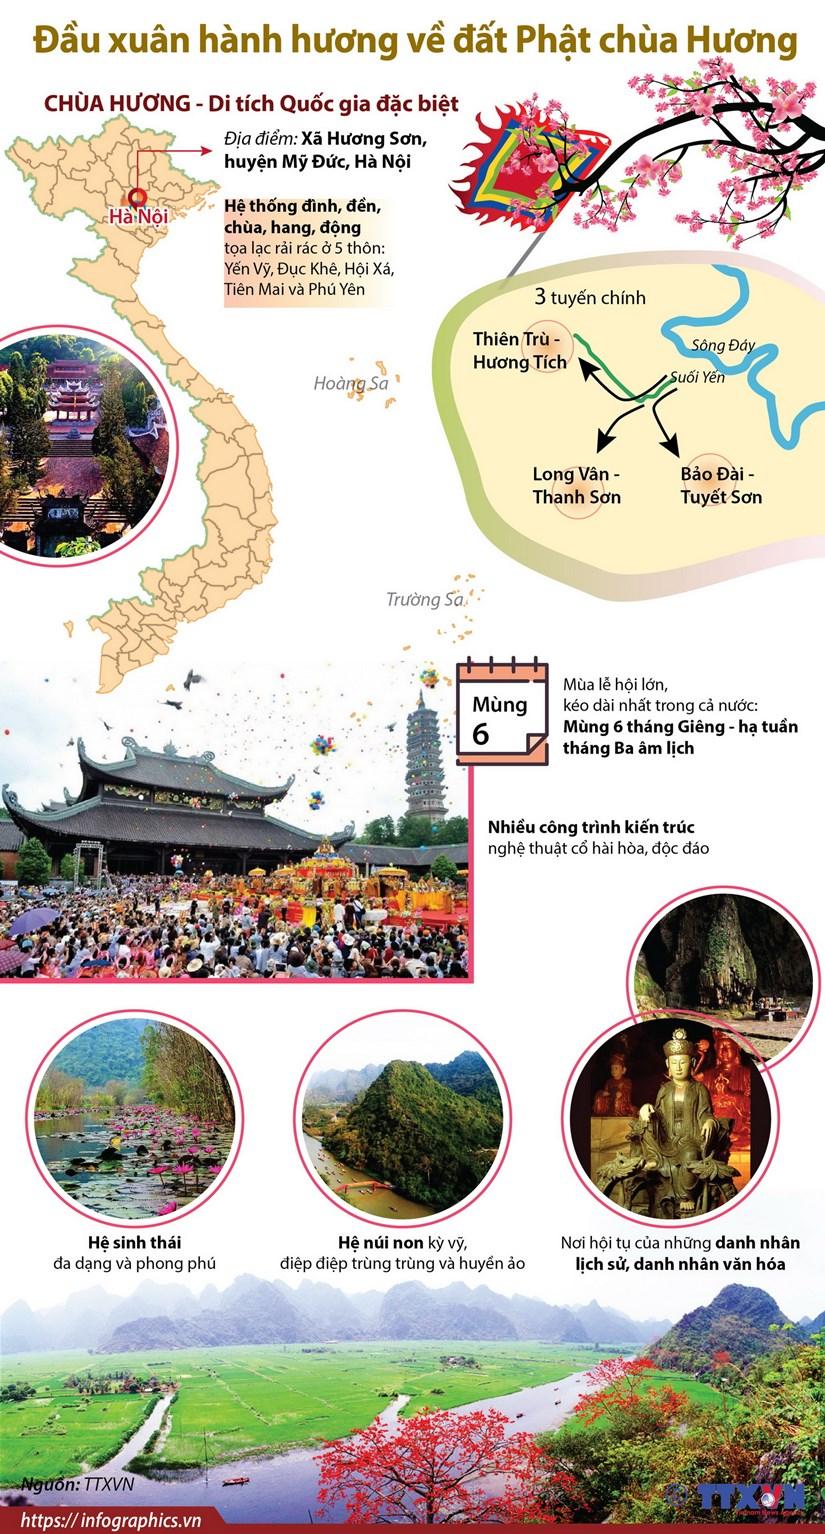 [Infographics] Dau xuan hanh huong ve dat Phat chua Huong hinh anh 1